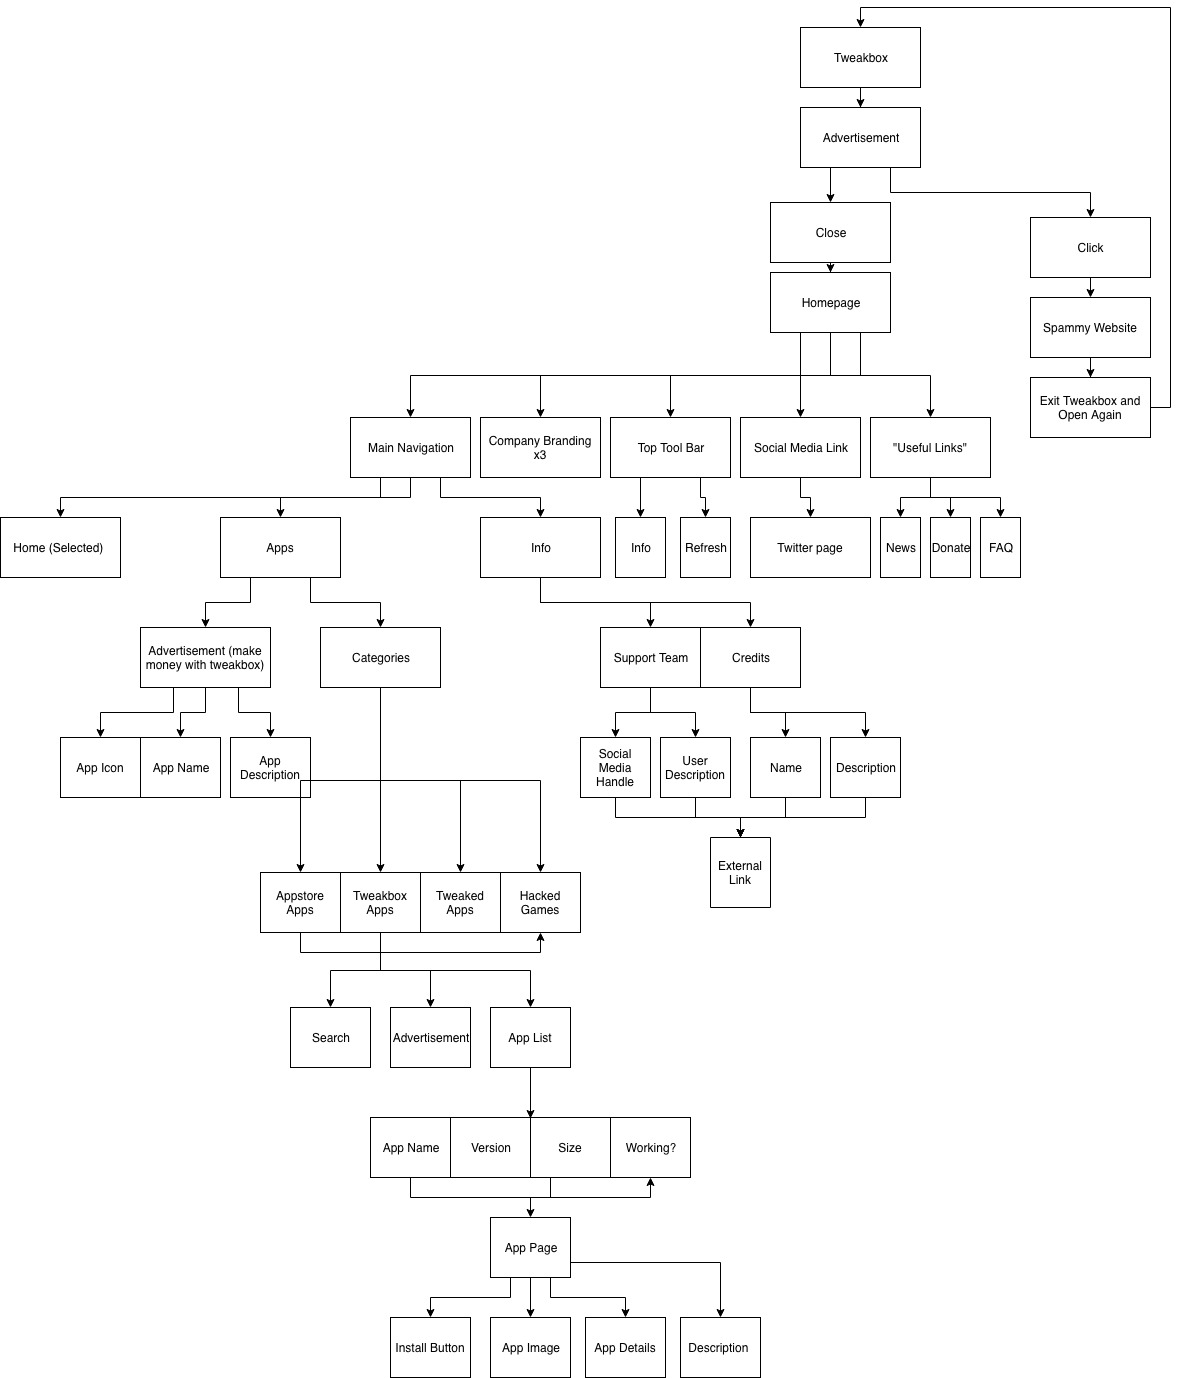 The current user flow for Tweakbox